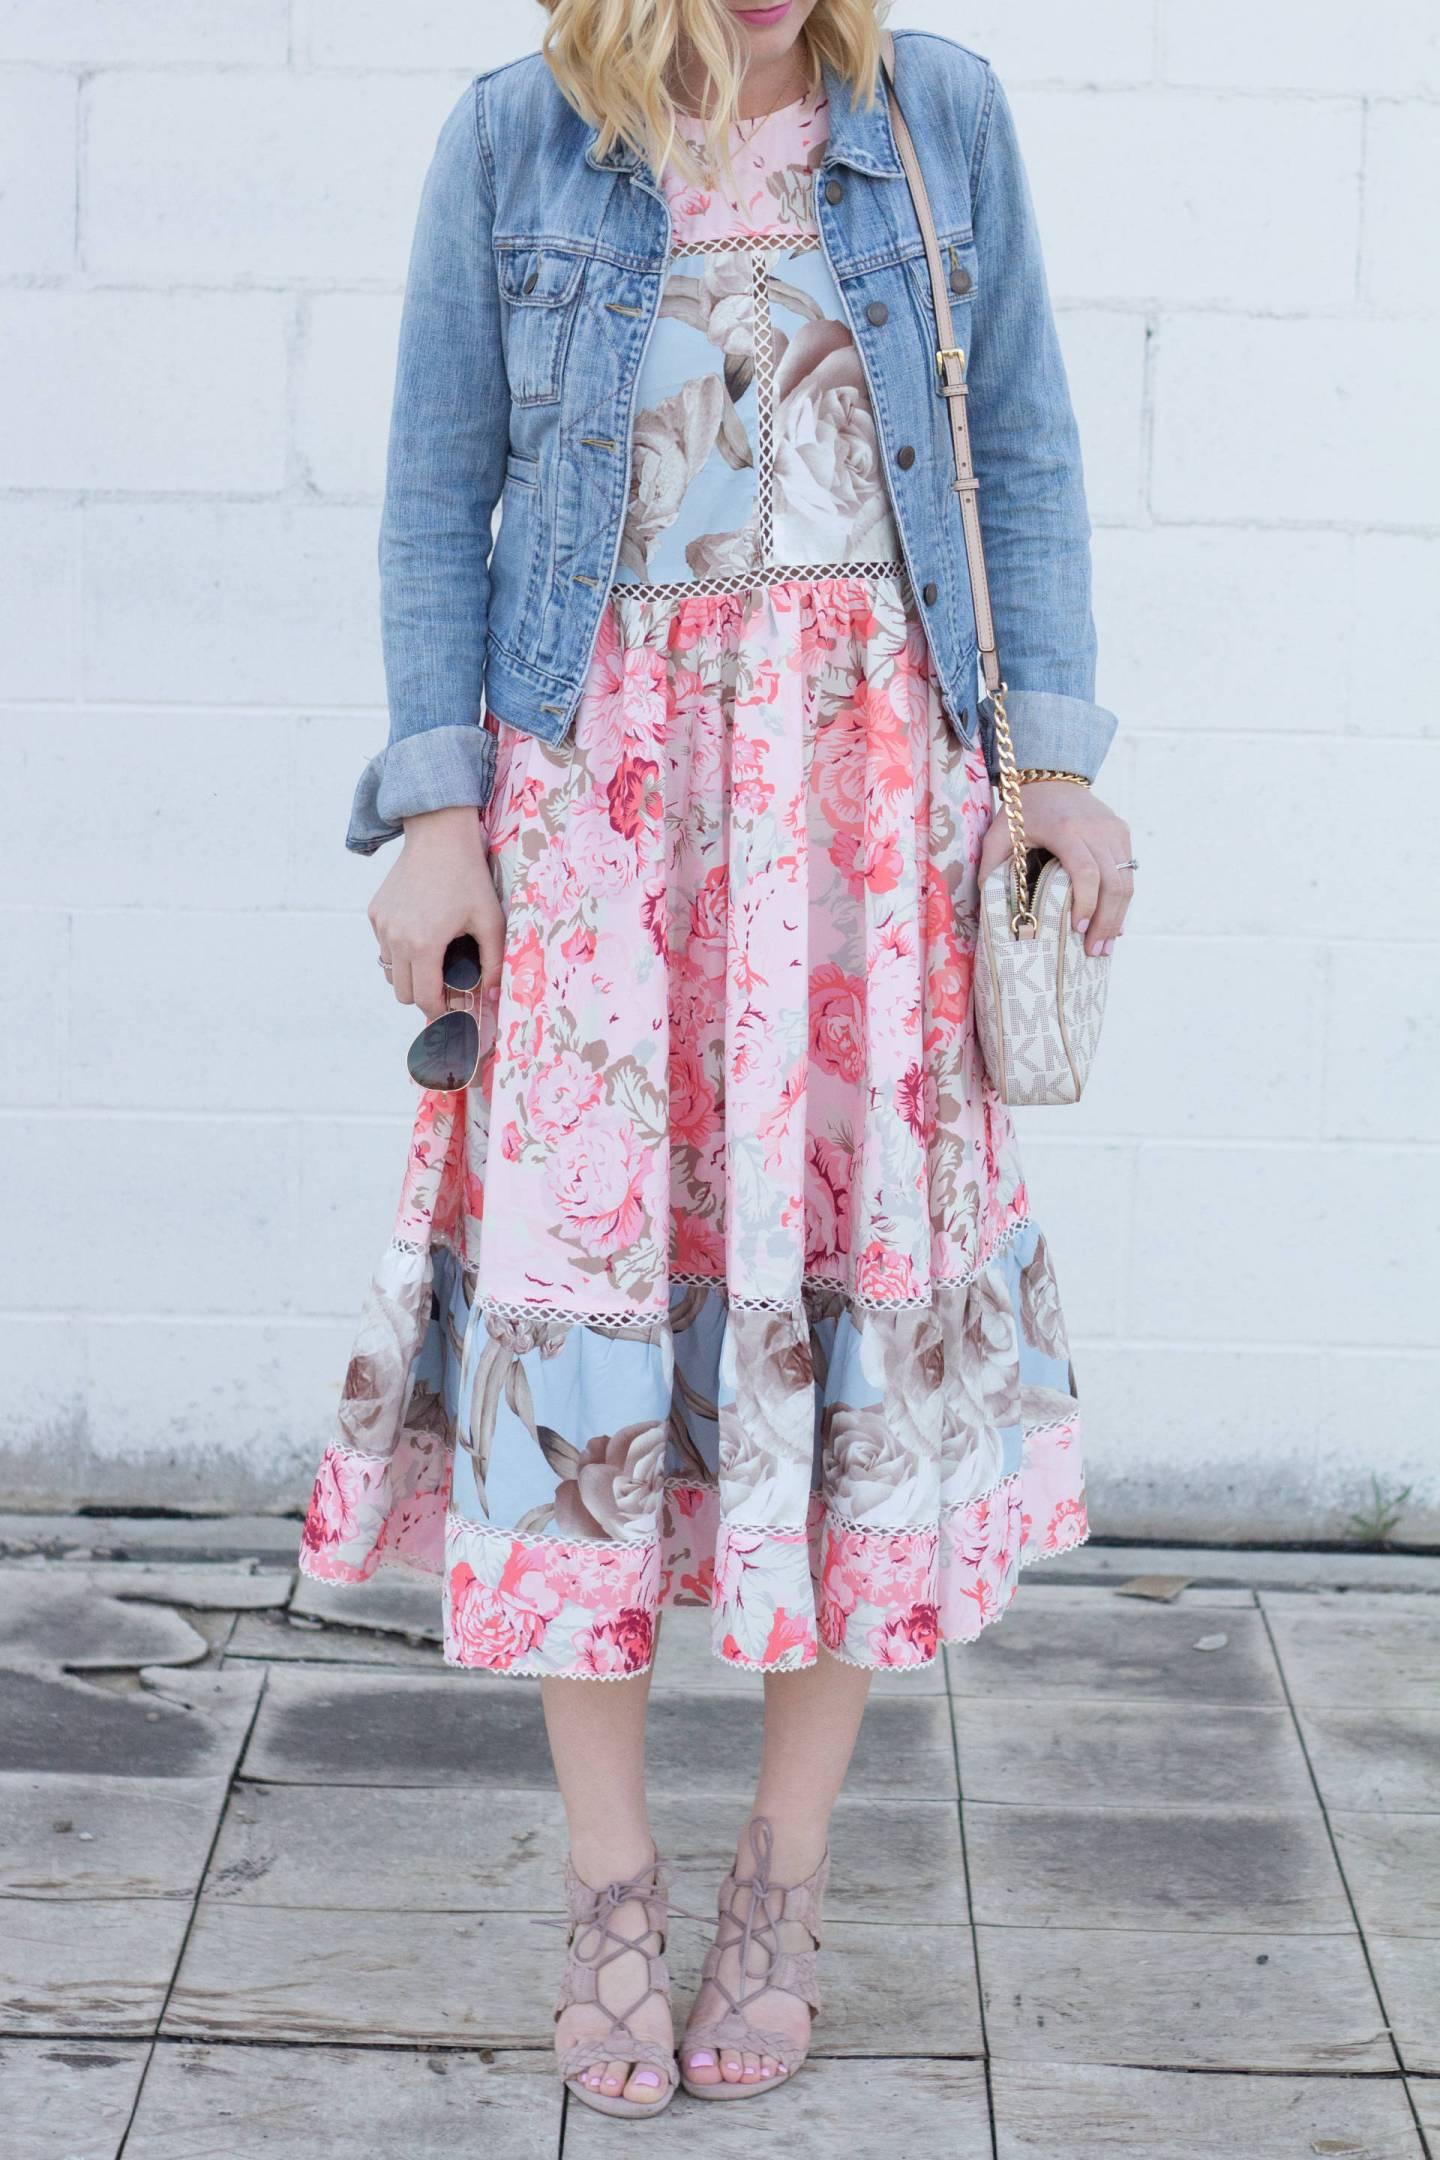 Floral Midi Dress + Block Heels.